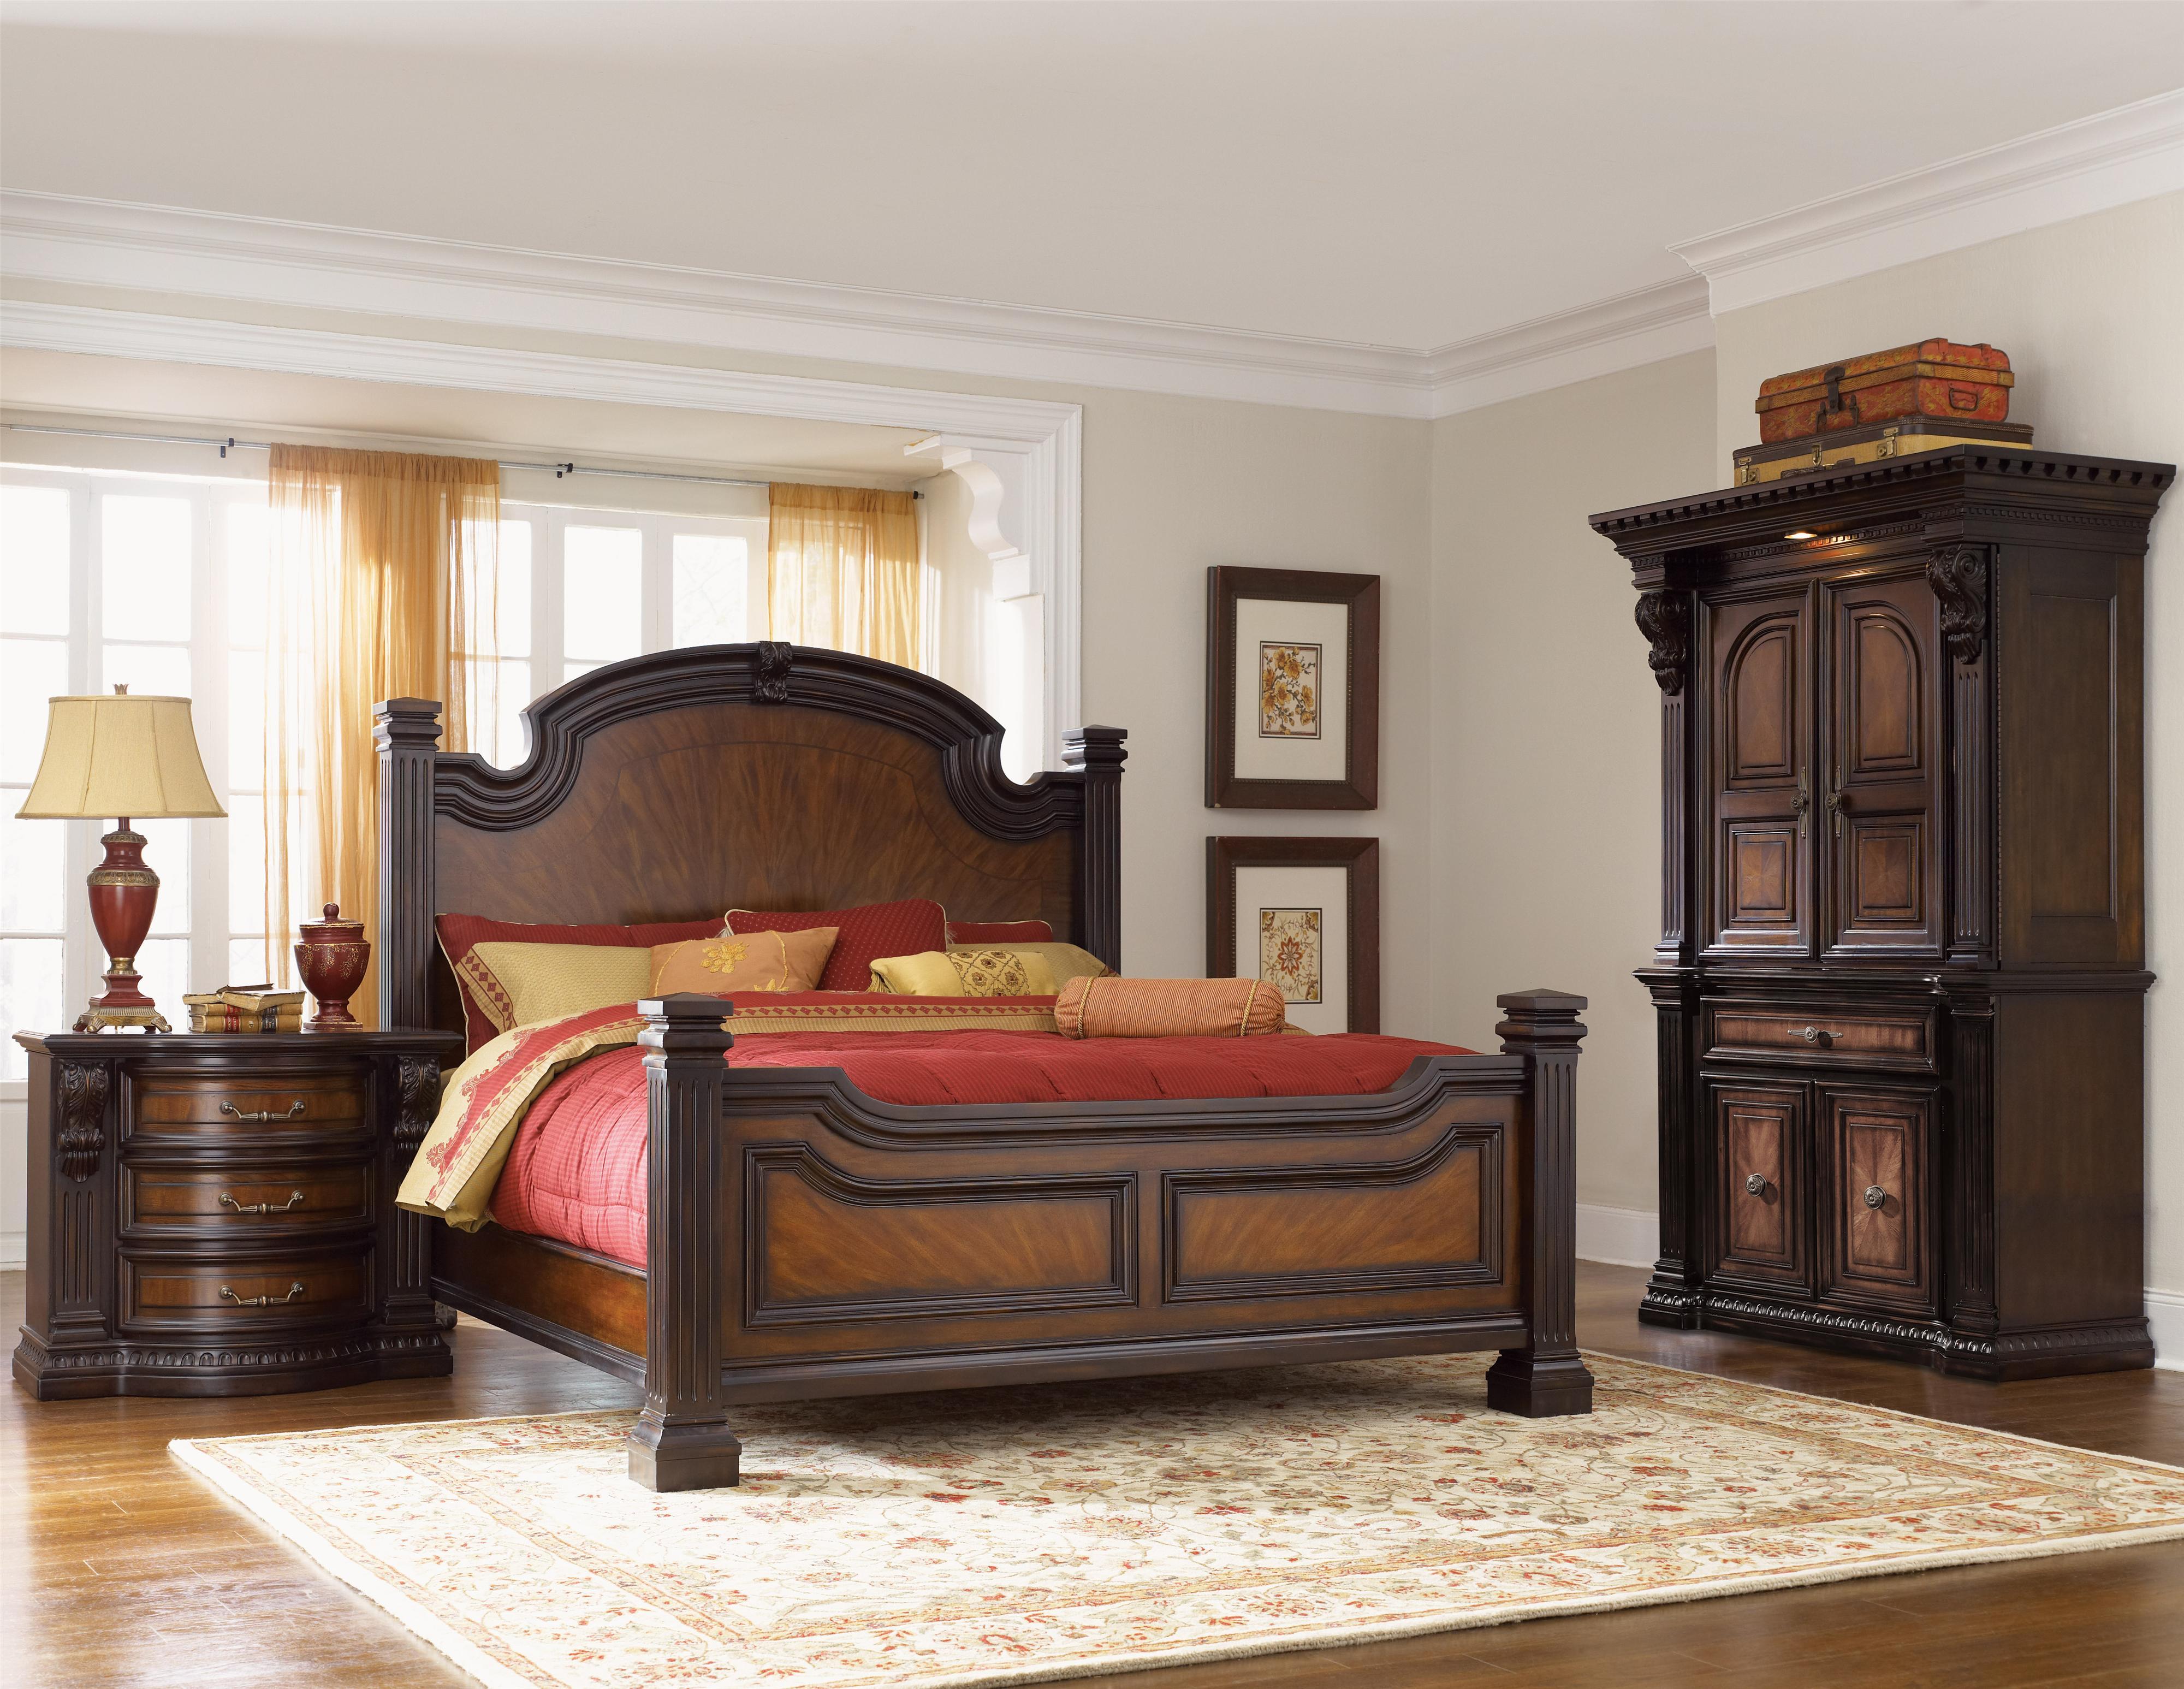 Grand Estates 02 By Fairmont Designs Royal Furniture Fairmont Designs Grand Estates Dealer